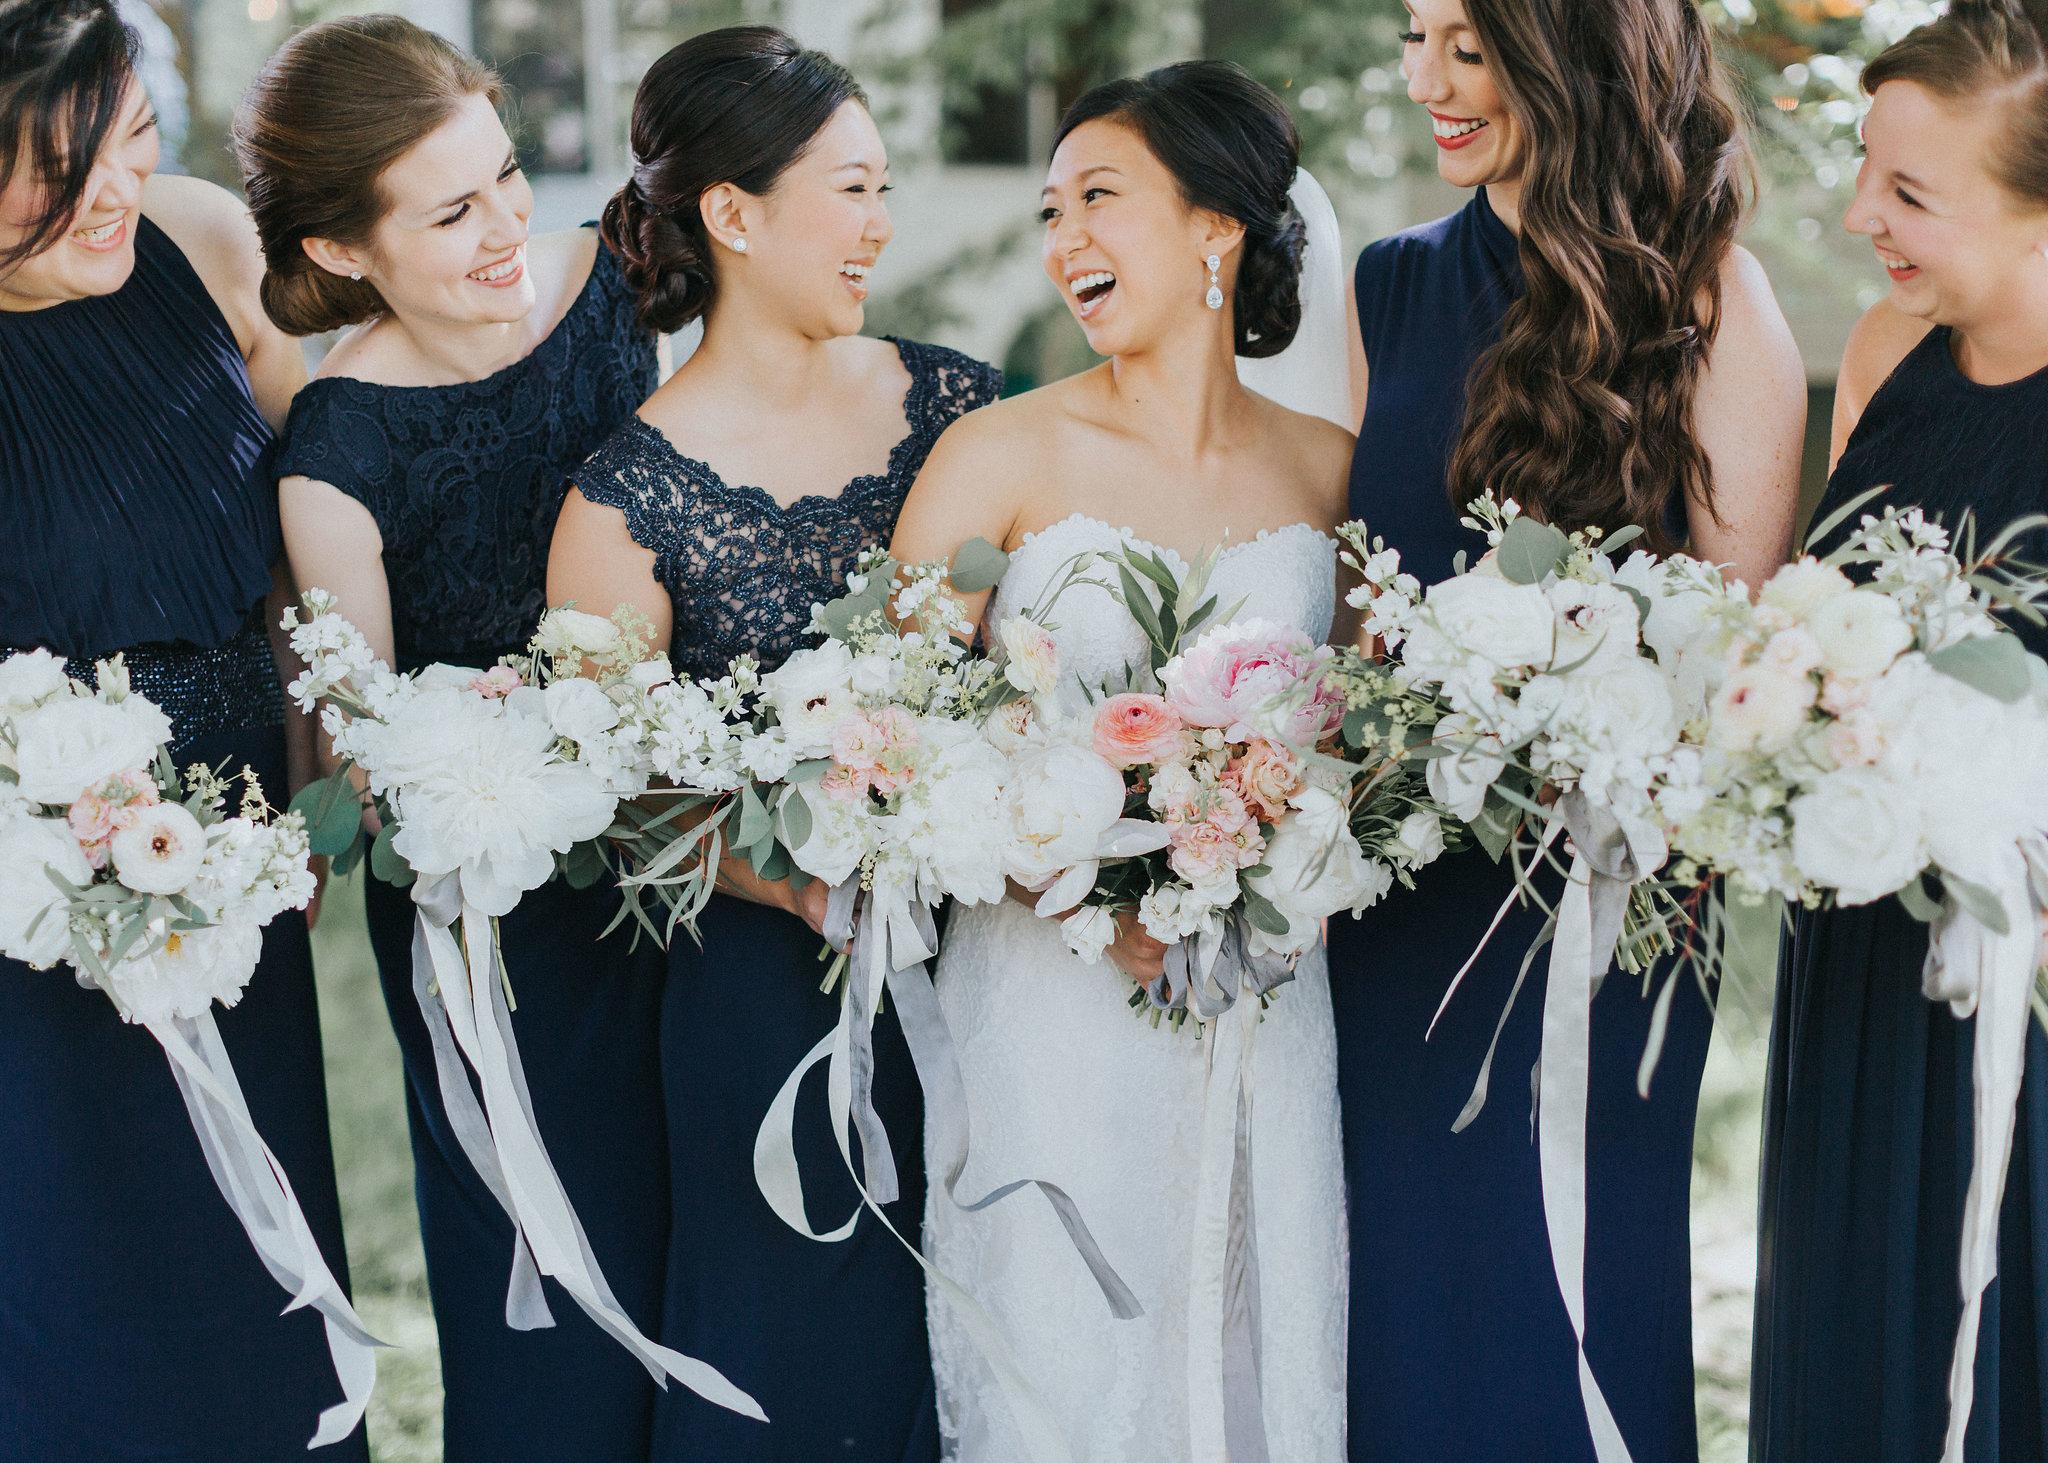 Melissa_Jason_Nonantum_Wedding_Portraits-143.jpg